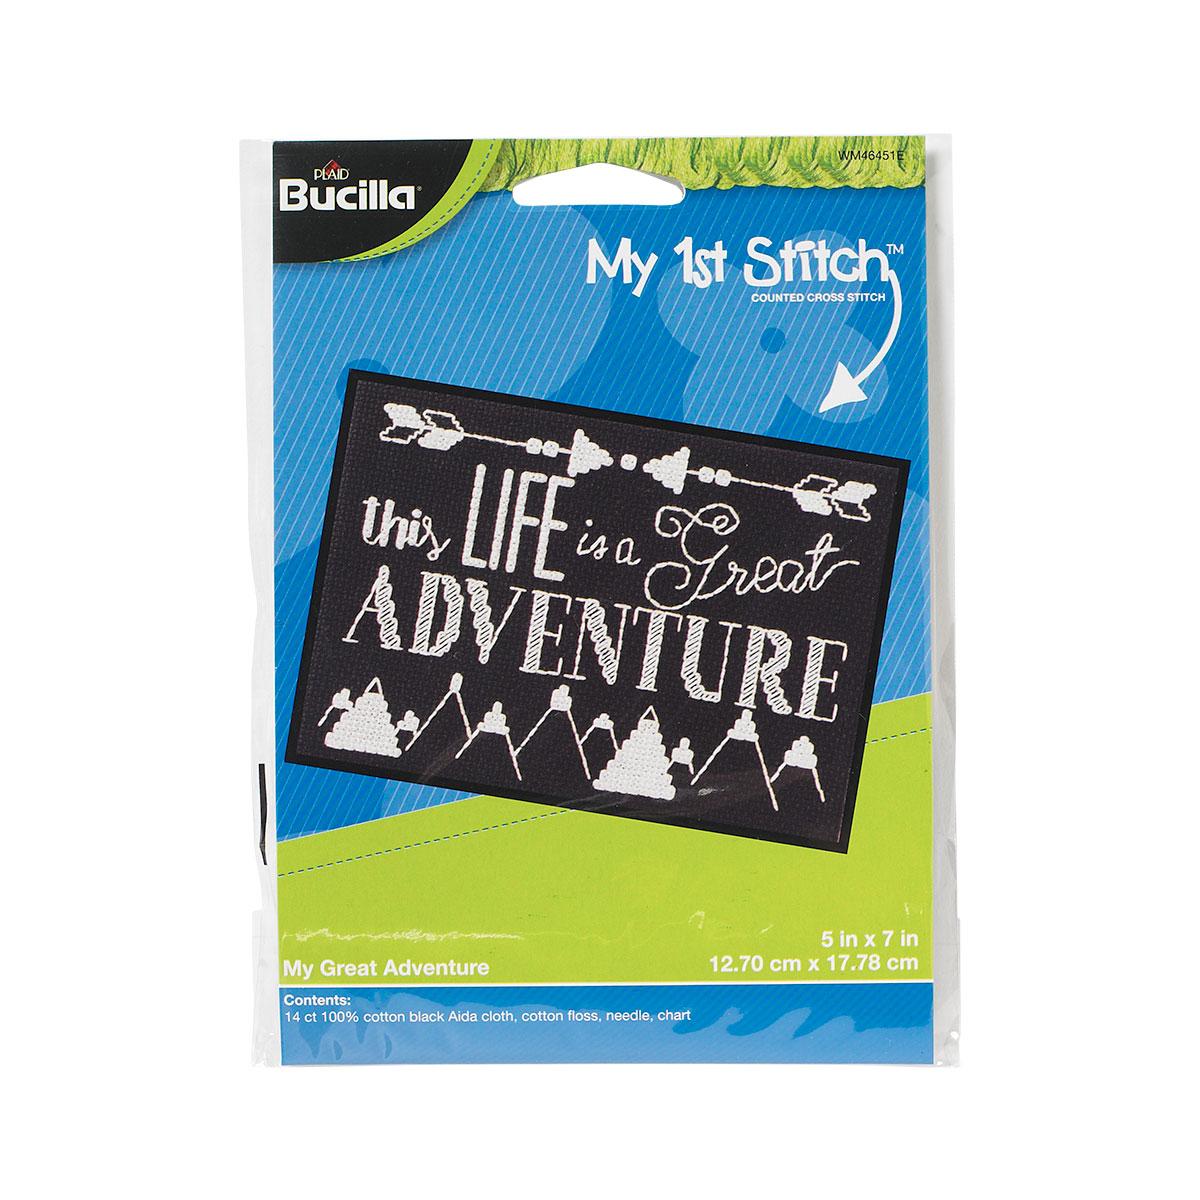 Bucilla ® My 1st Stitch™ - Counted Cross Stitch Kits - My Great Adventure - WM46451E